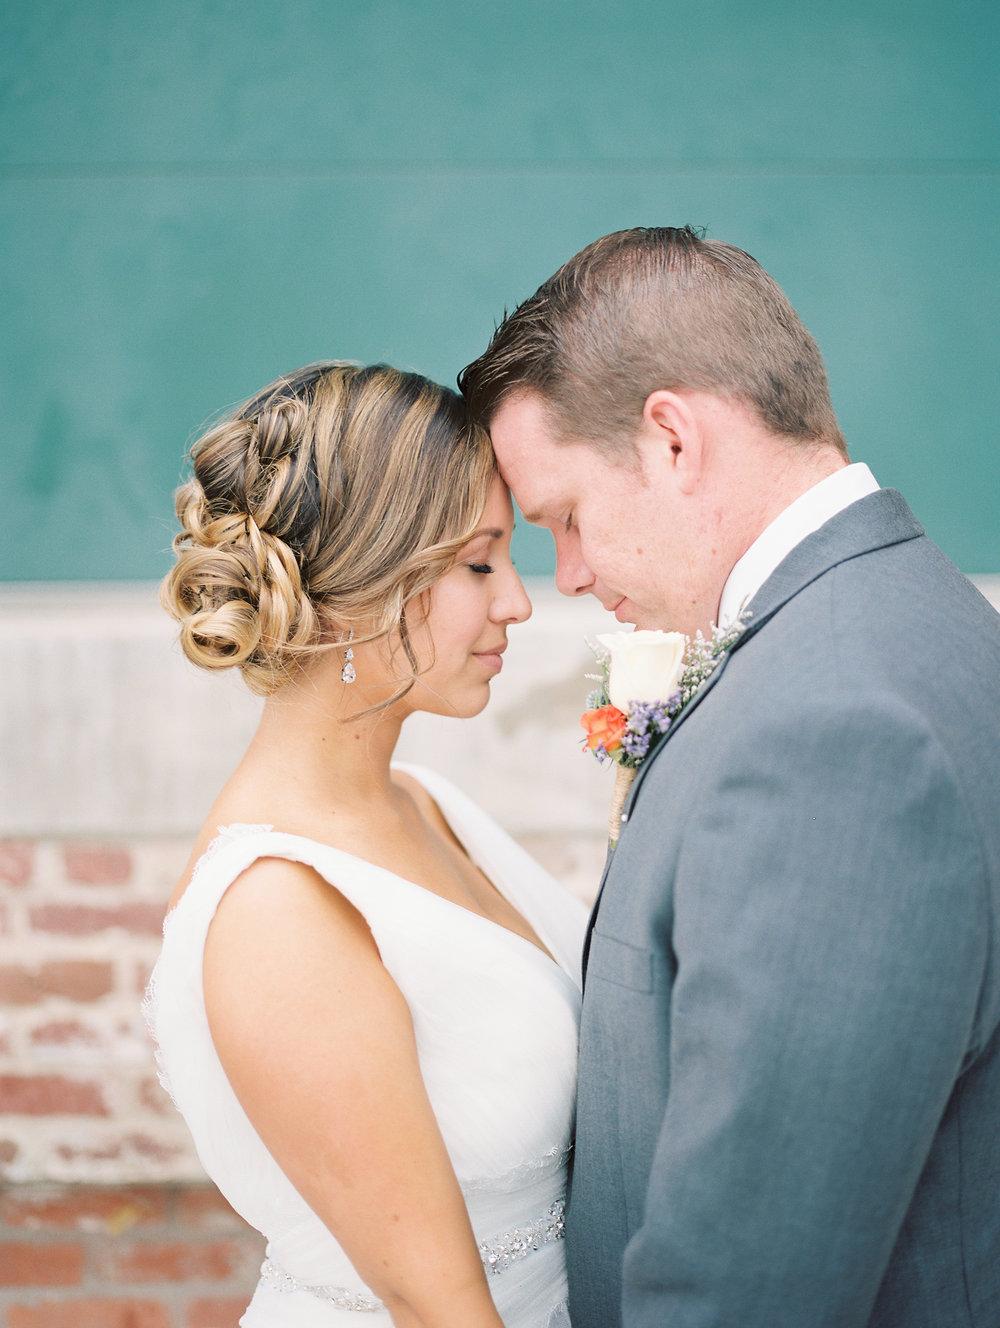 city-hall-wedding-filmscans-28.jpg